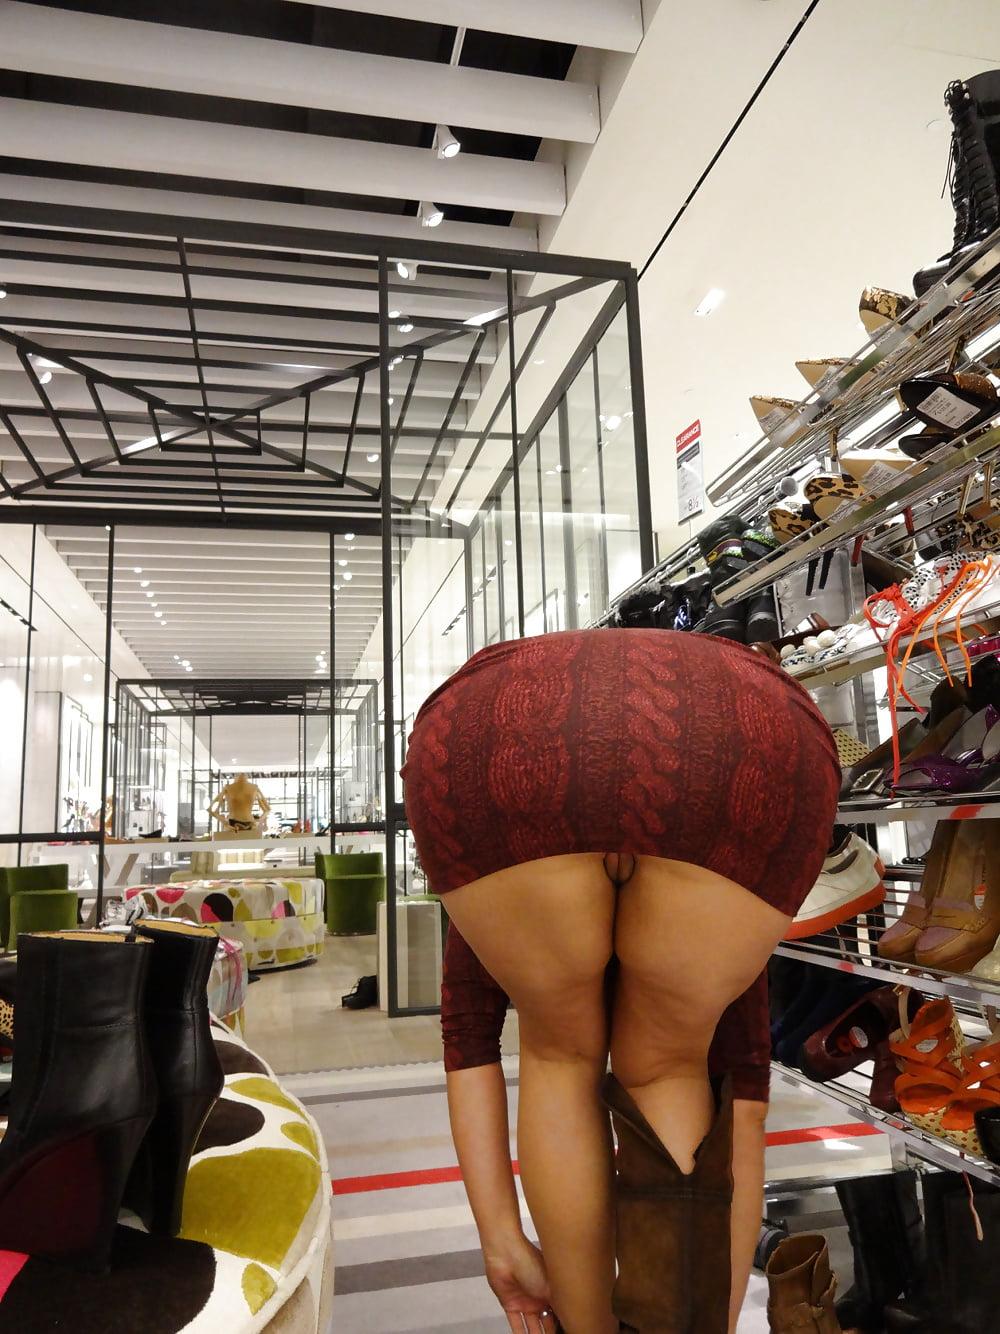 Upskirt voyeur in the shopping centre